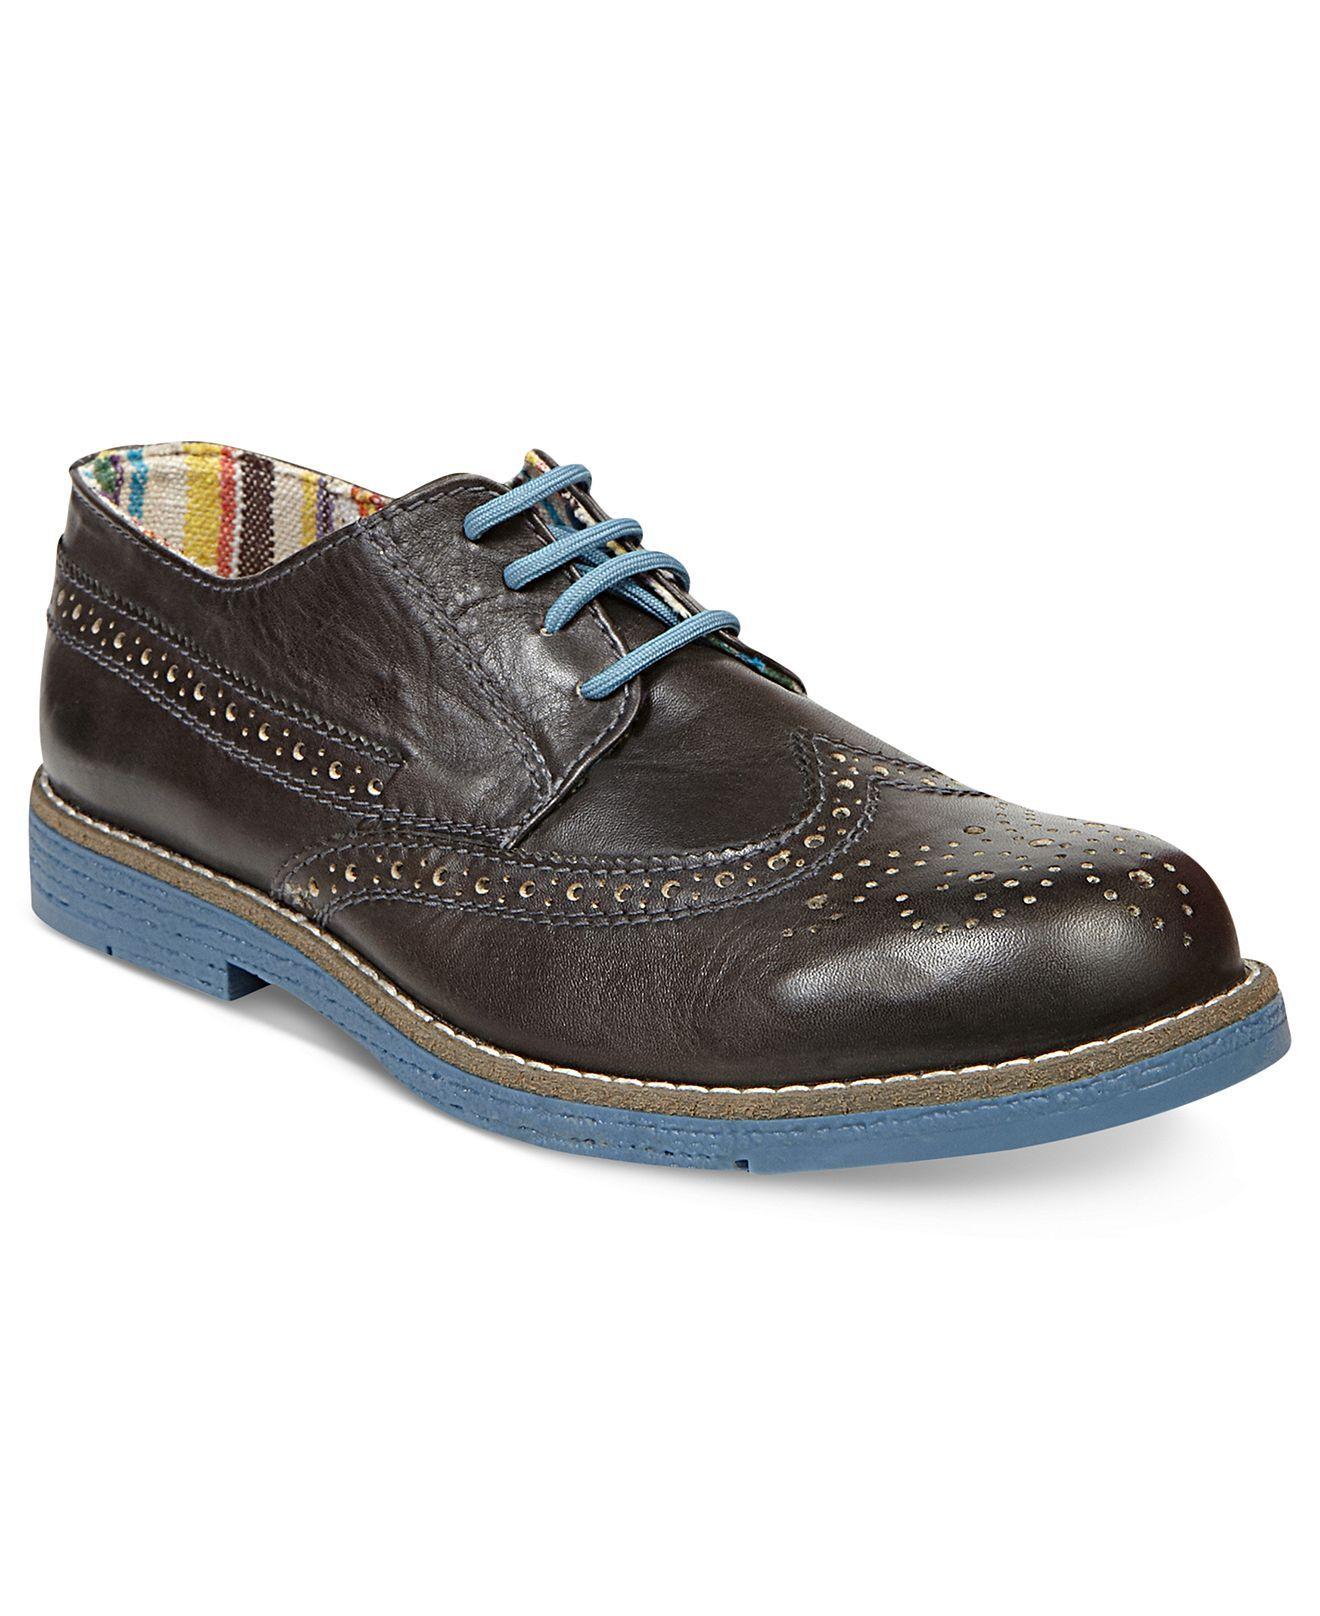 a89e4cdb6ca Steve Madden Men's Shoes, Jazzman Wingtip Oxfords - Mens Shoes - Macy's